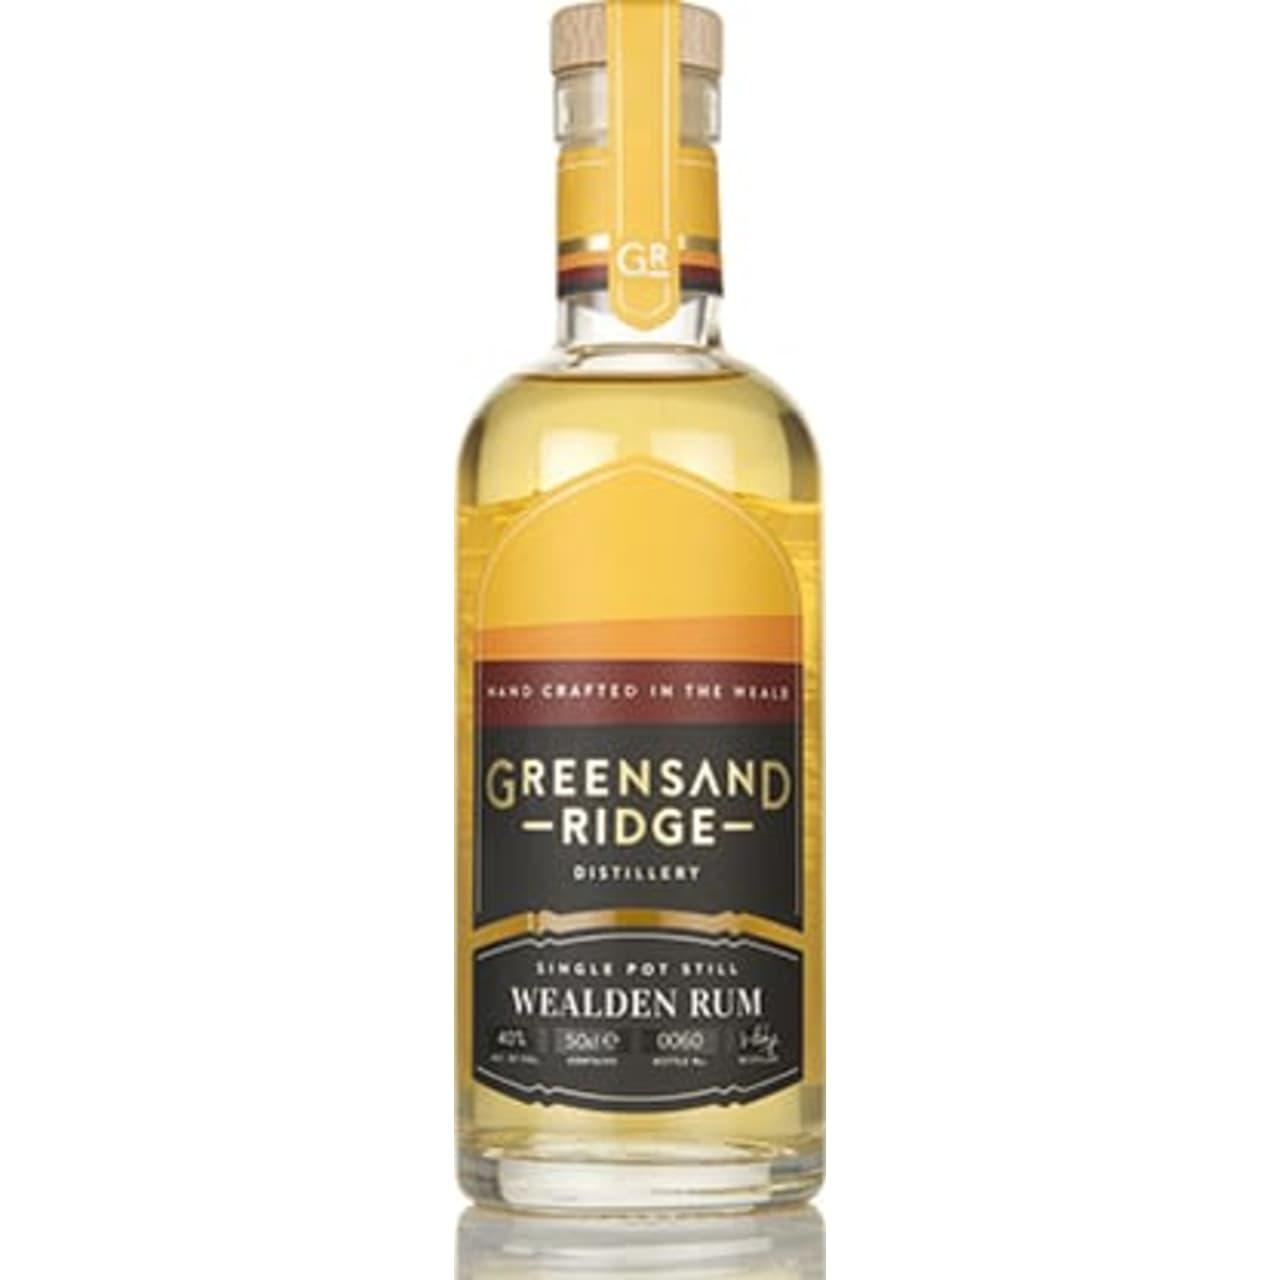 Product Image - Greensand Ridge Wealden Rum